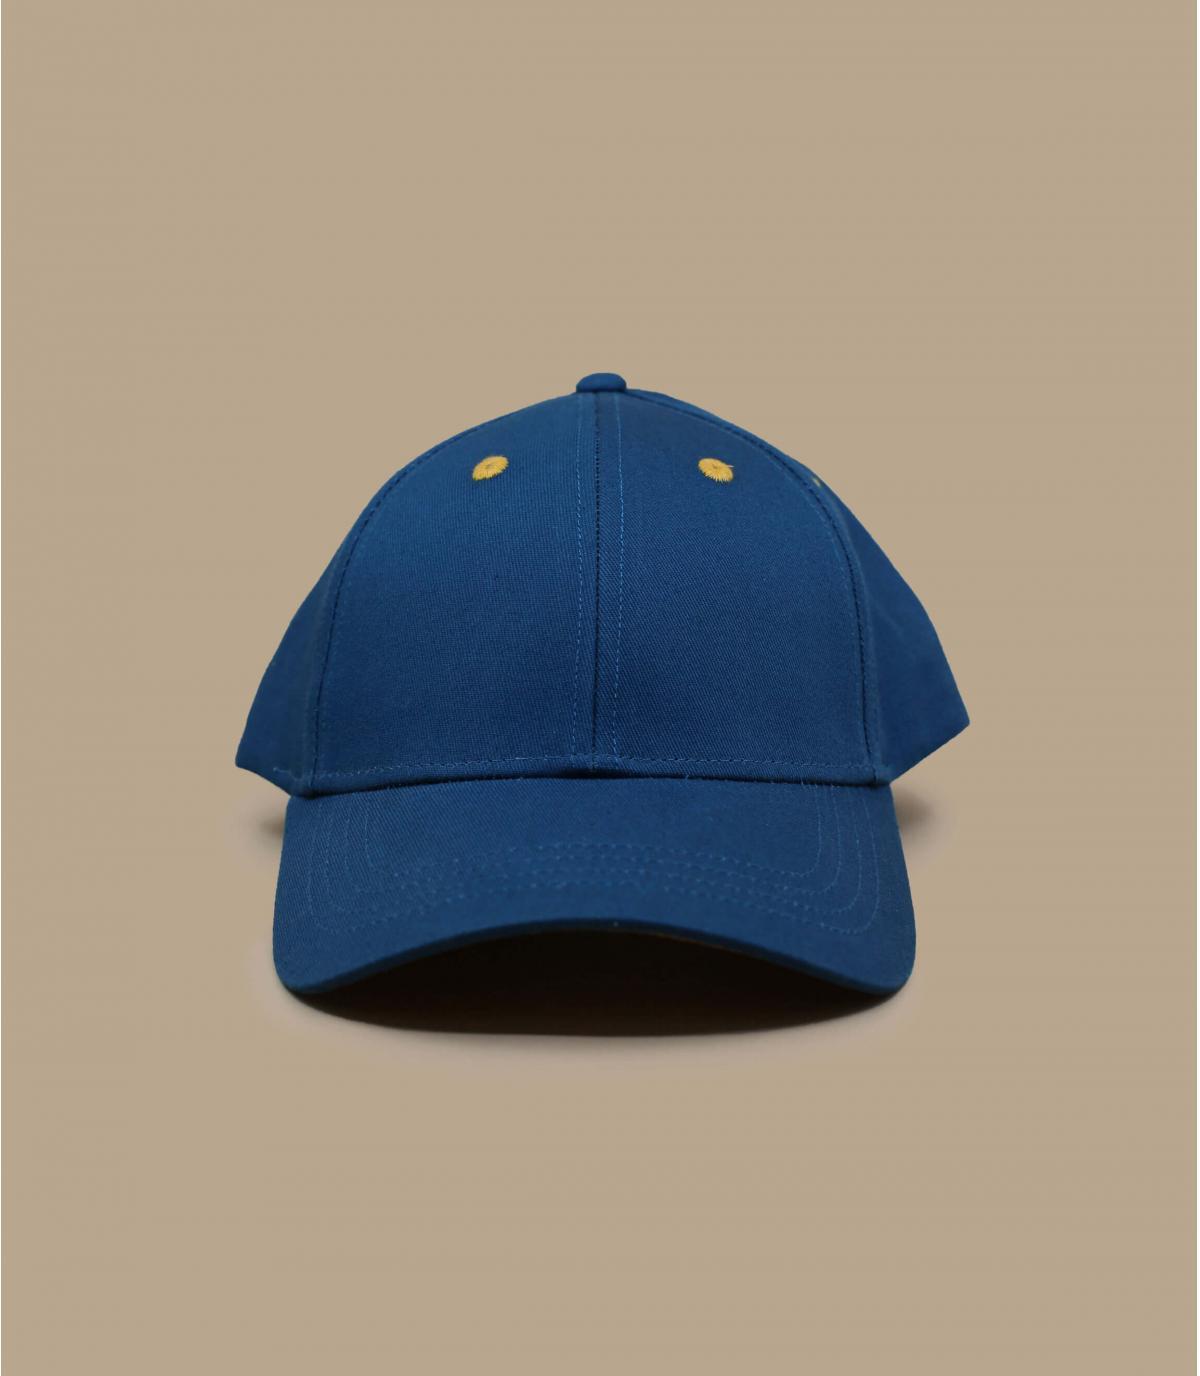 Erwachsene Cap blau Enfant terrible